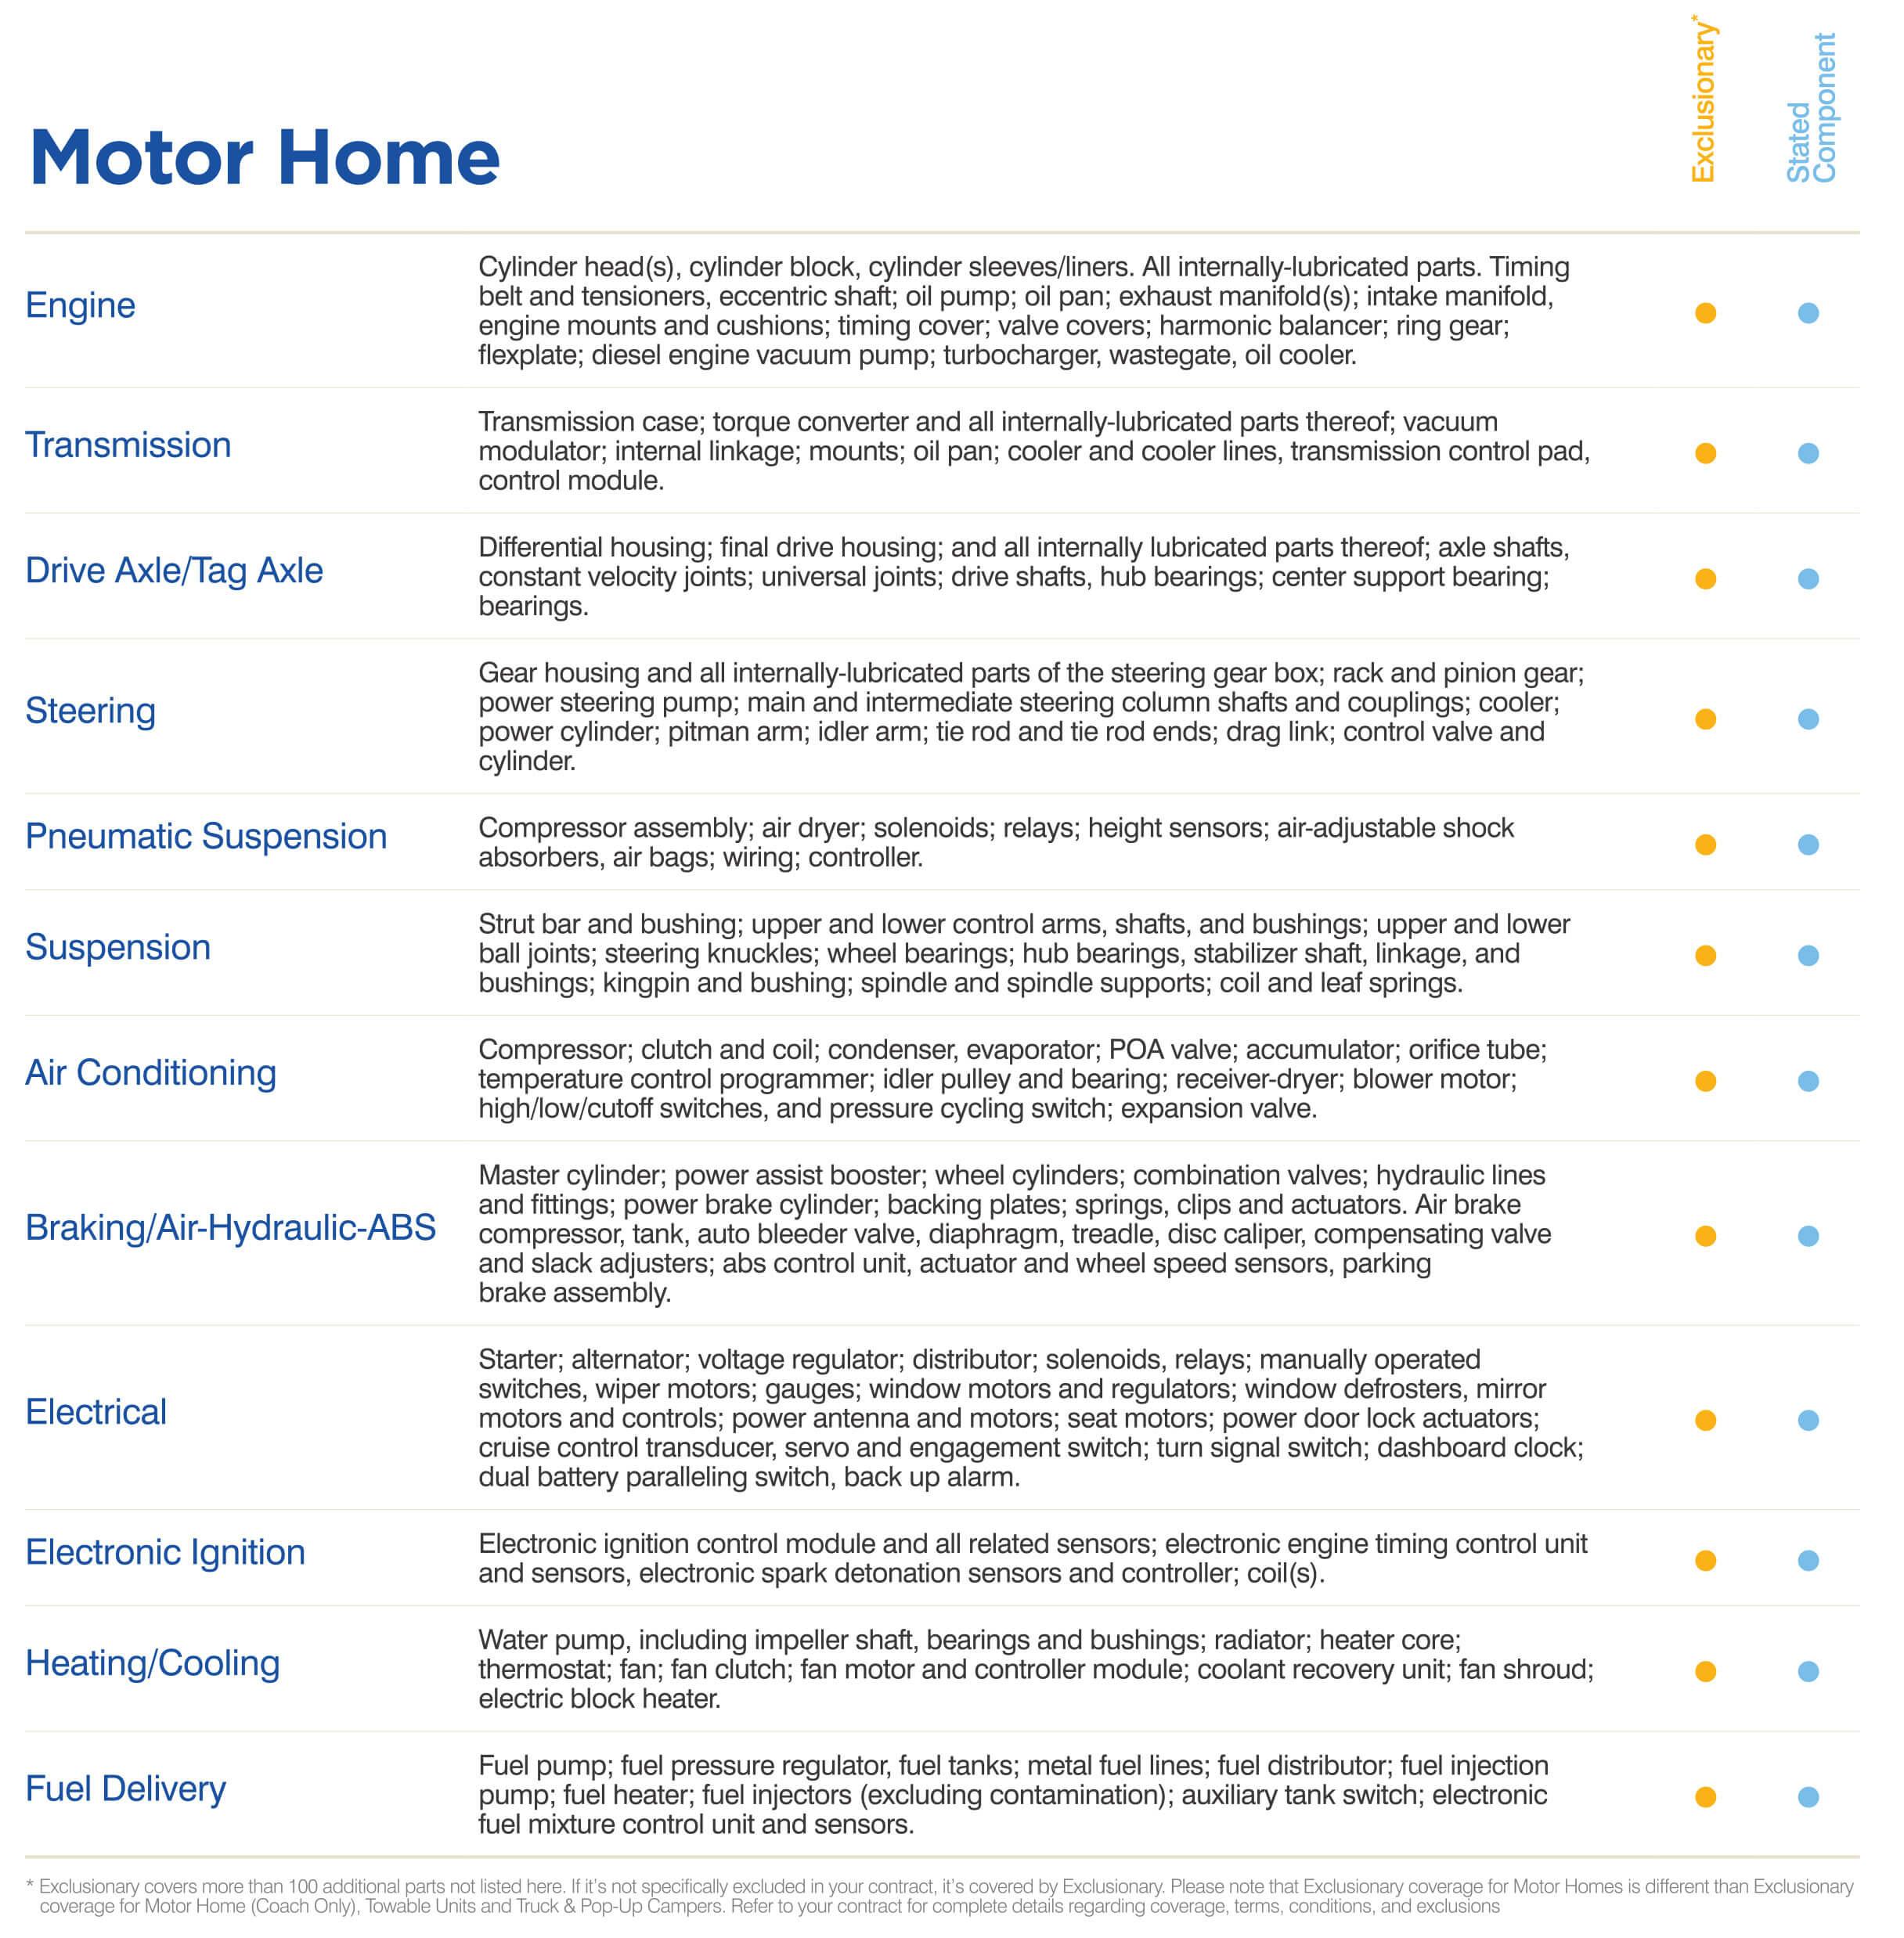 Motor Home